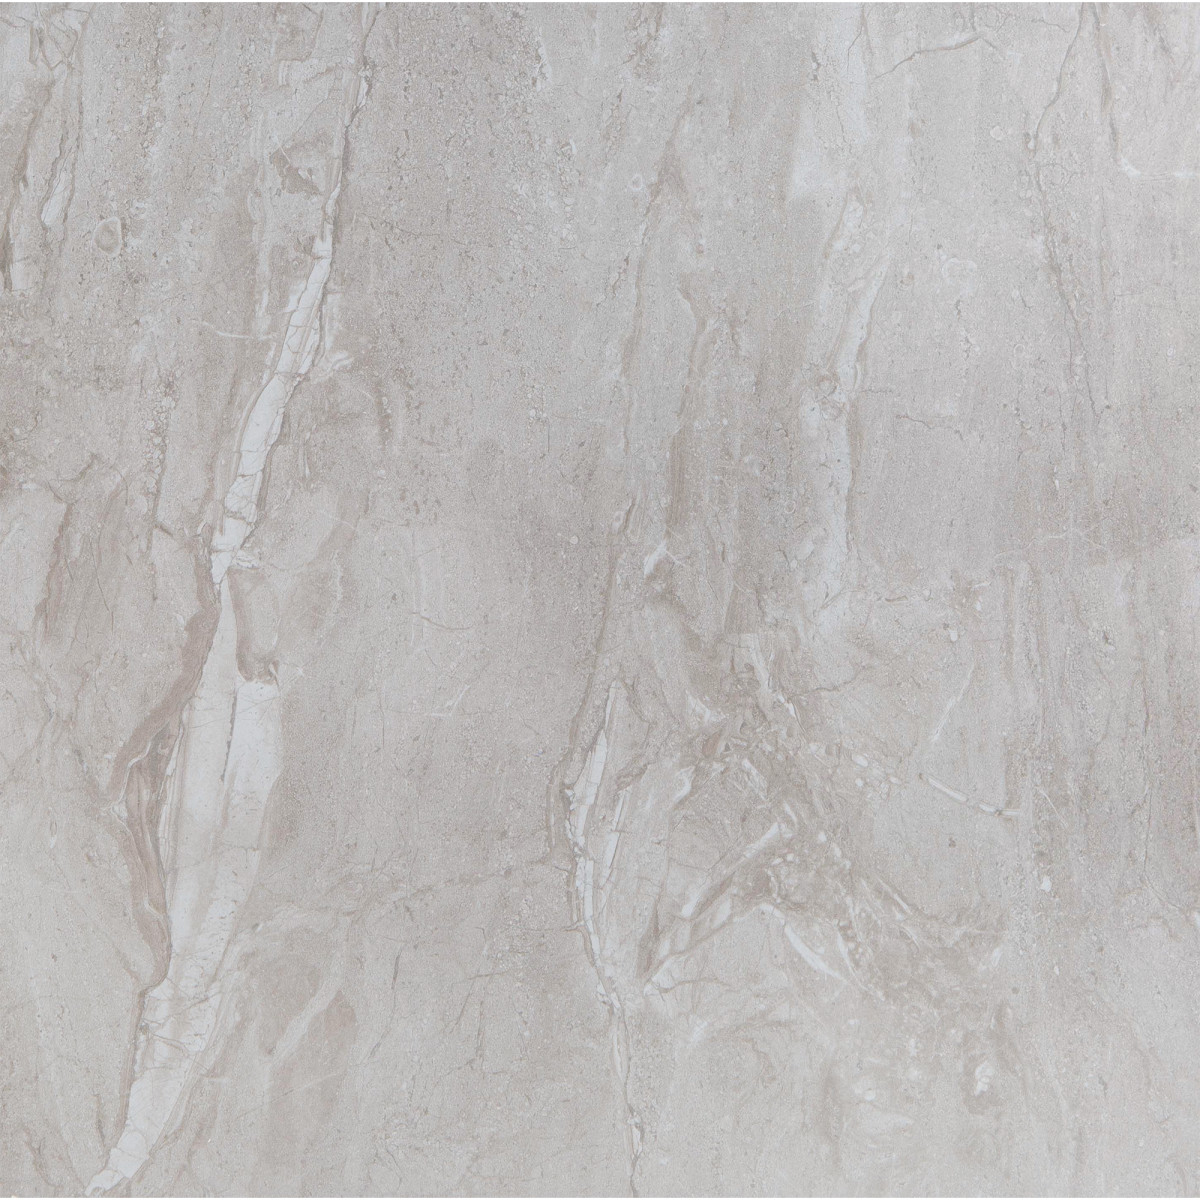 Керамогранит Marmo Milano 60.7х60.7 см 1.105 м² цвет серый